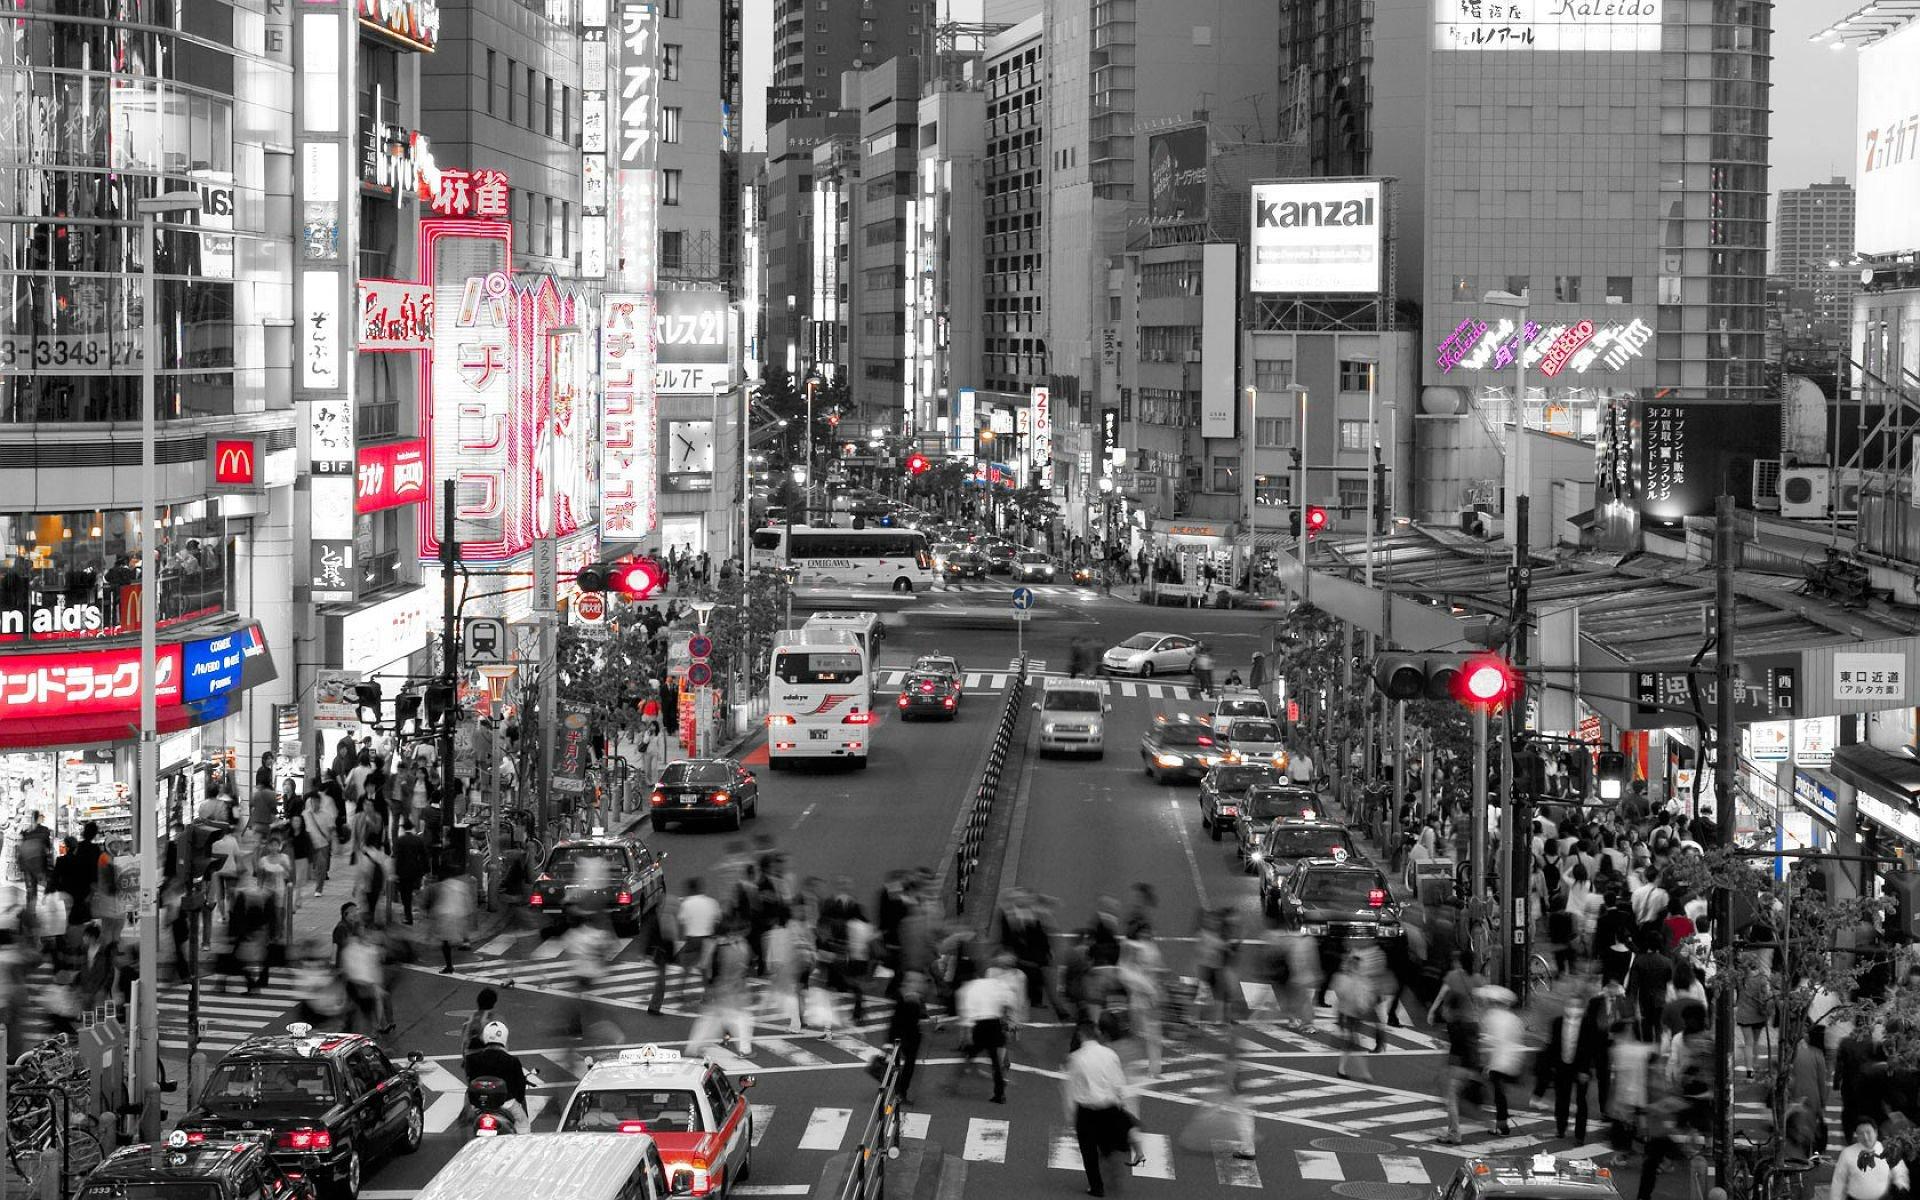 art artwork photoshop manipulation fantasy photo artistic art artwork photoshop manipulation fantasy photo artistic 1920x1200 872182 up